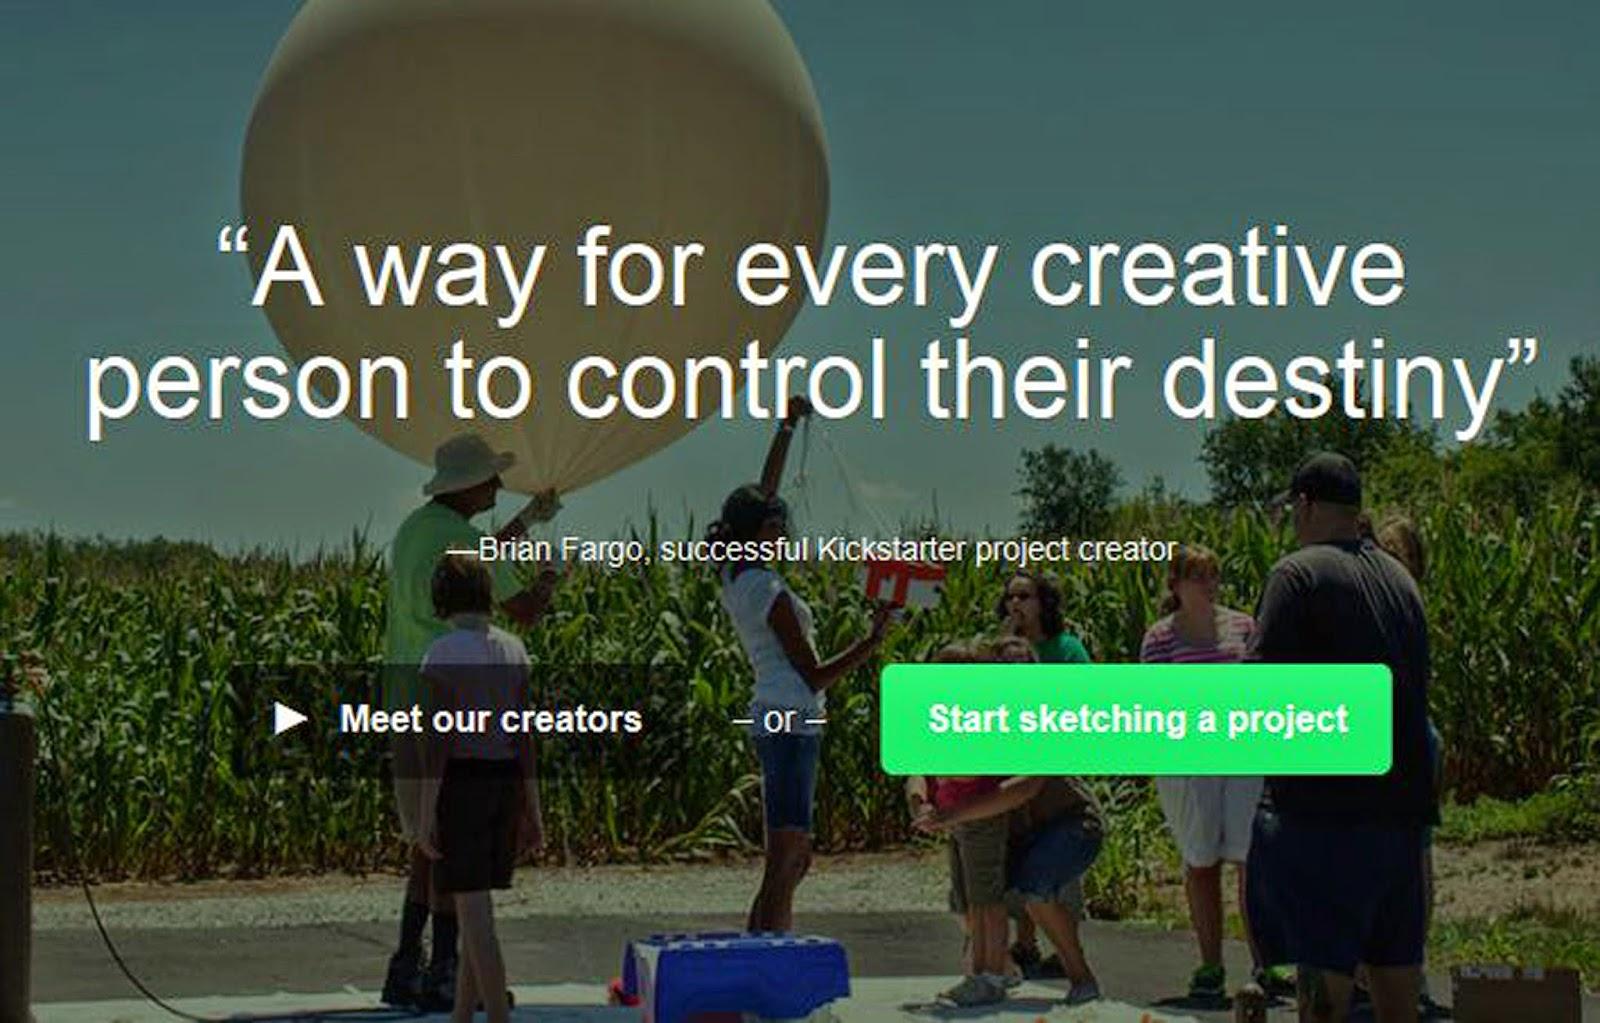 https://www.kickstarter.com/projects/609688641/the-next-step-krafty-max-originals